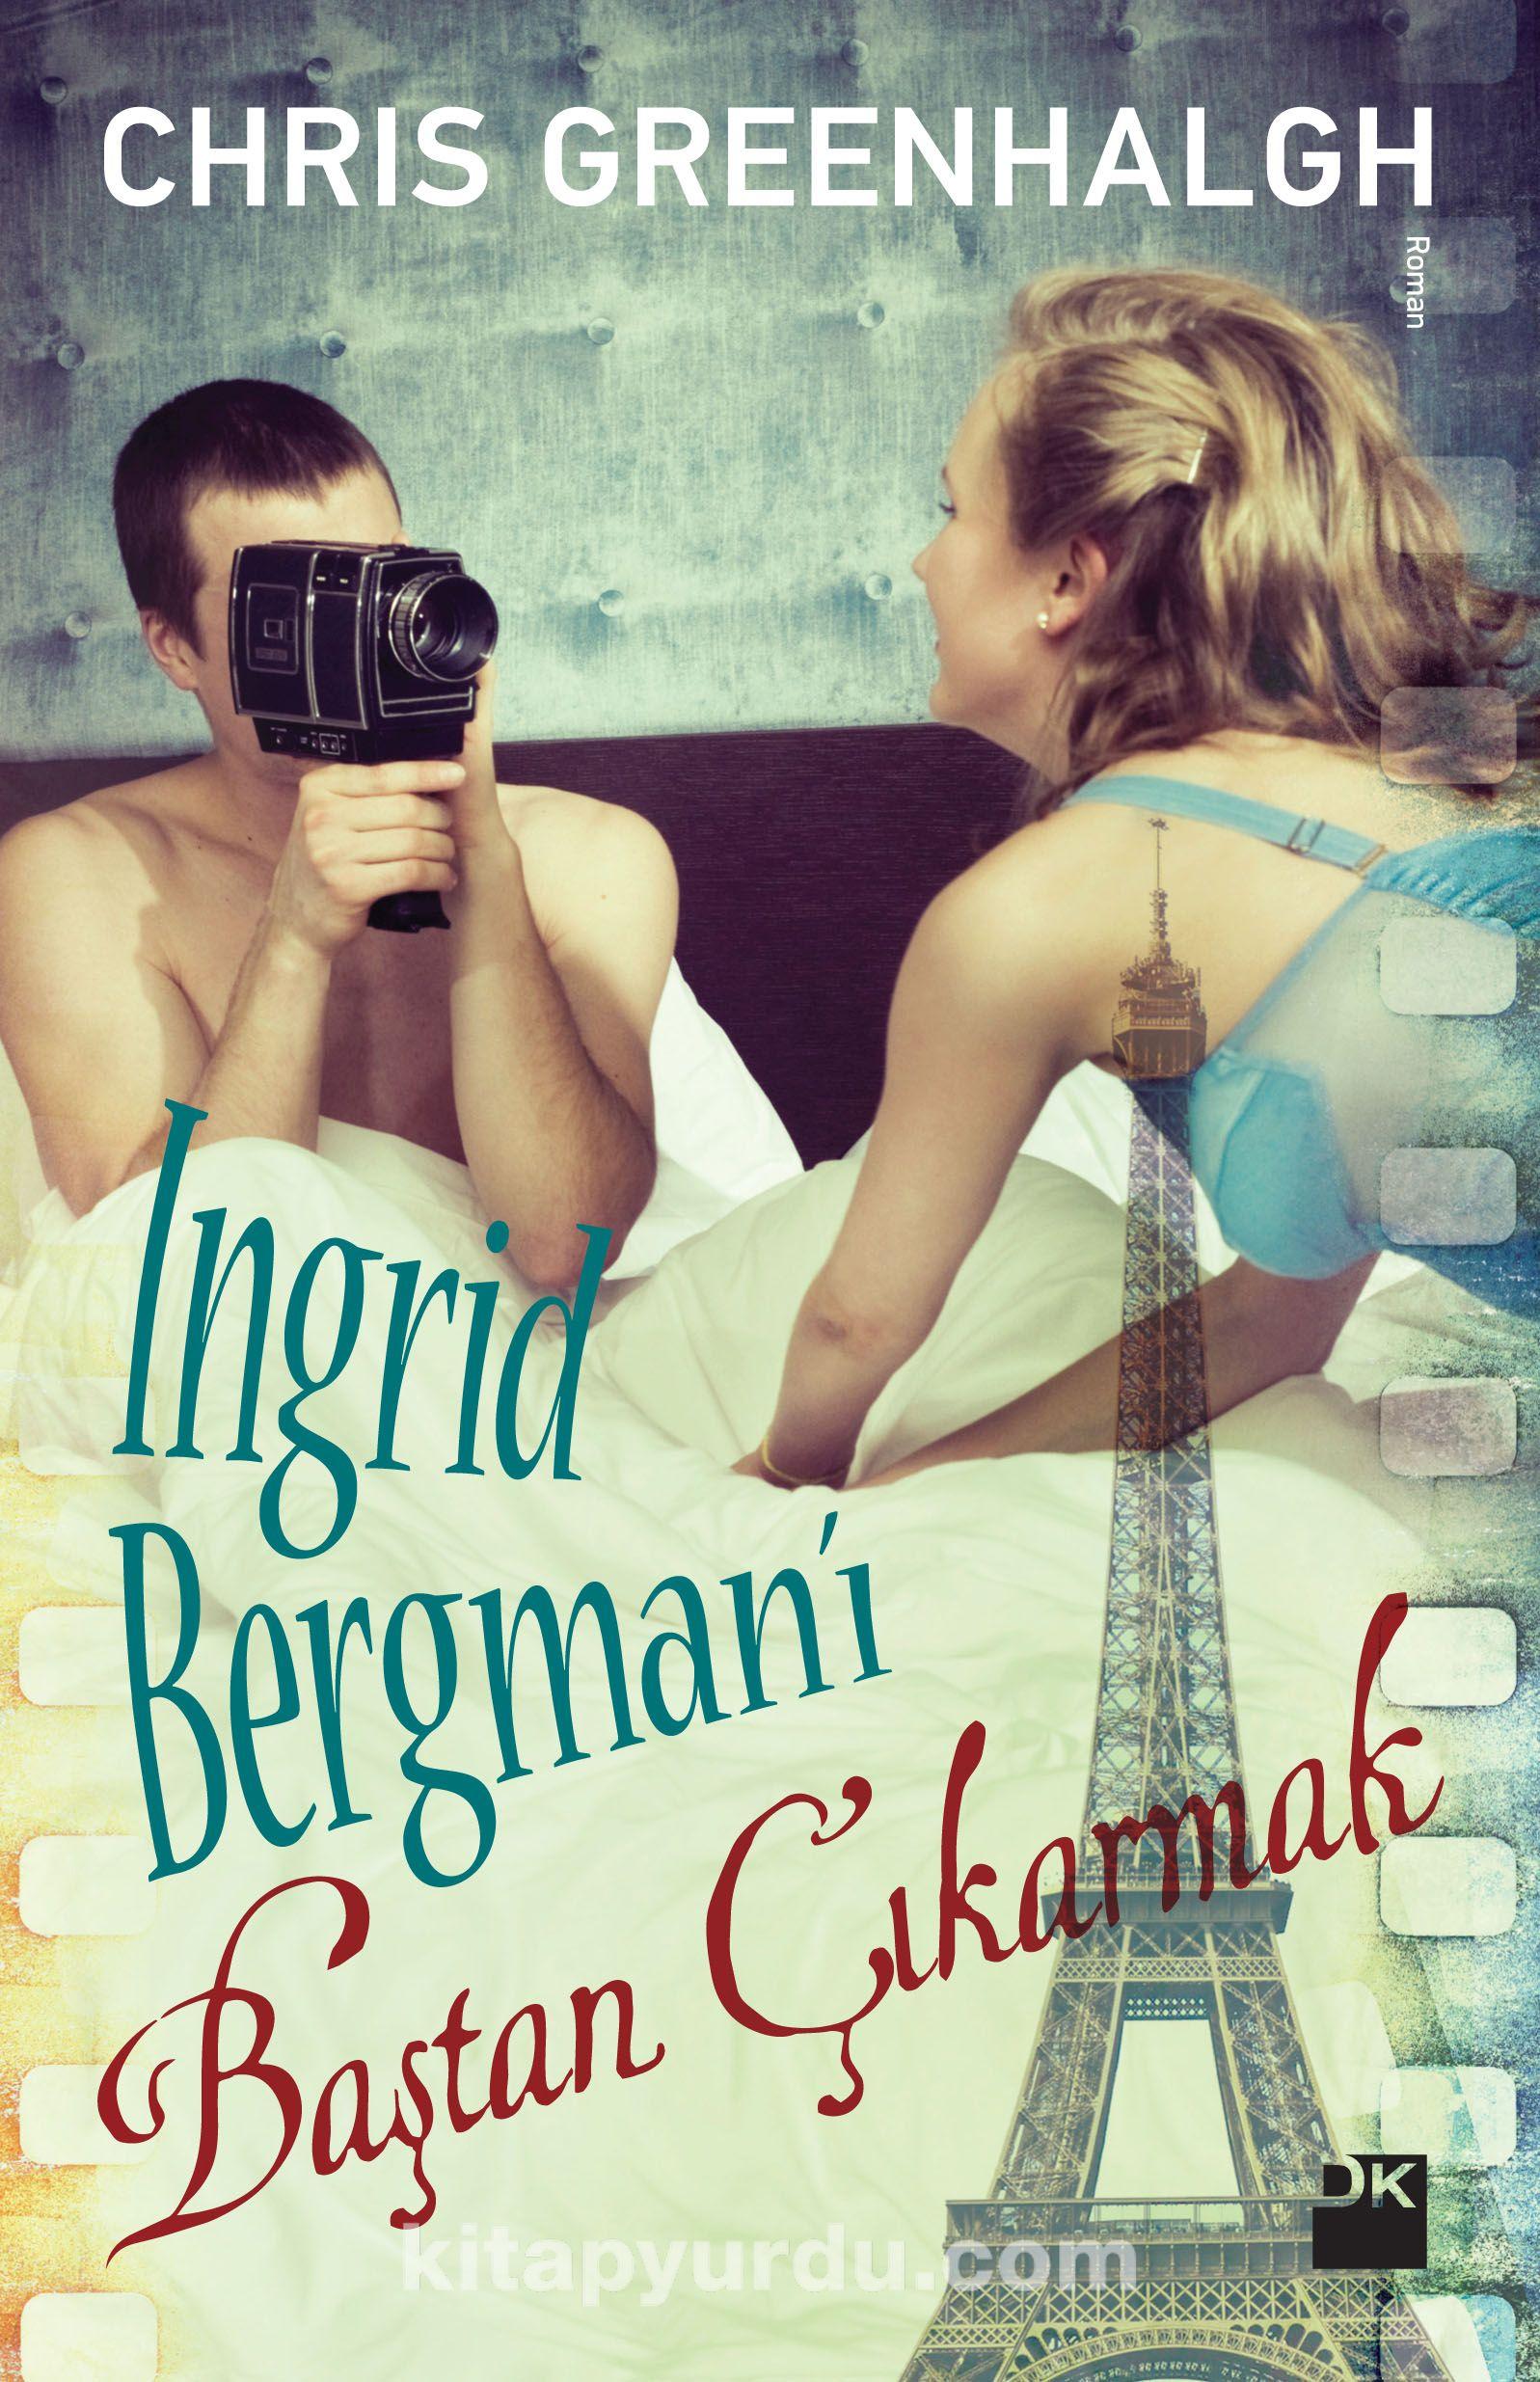 Ingrid Bergman'ı Baştan Çıkarmak - Chris Greenhalgh pdf epub